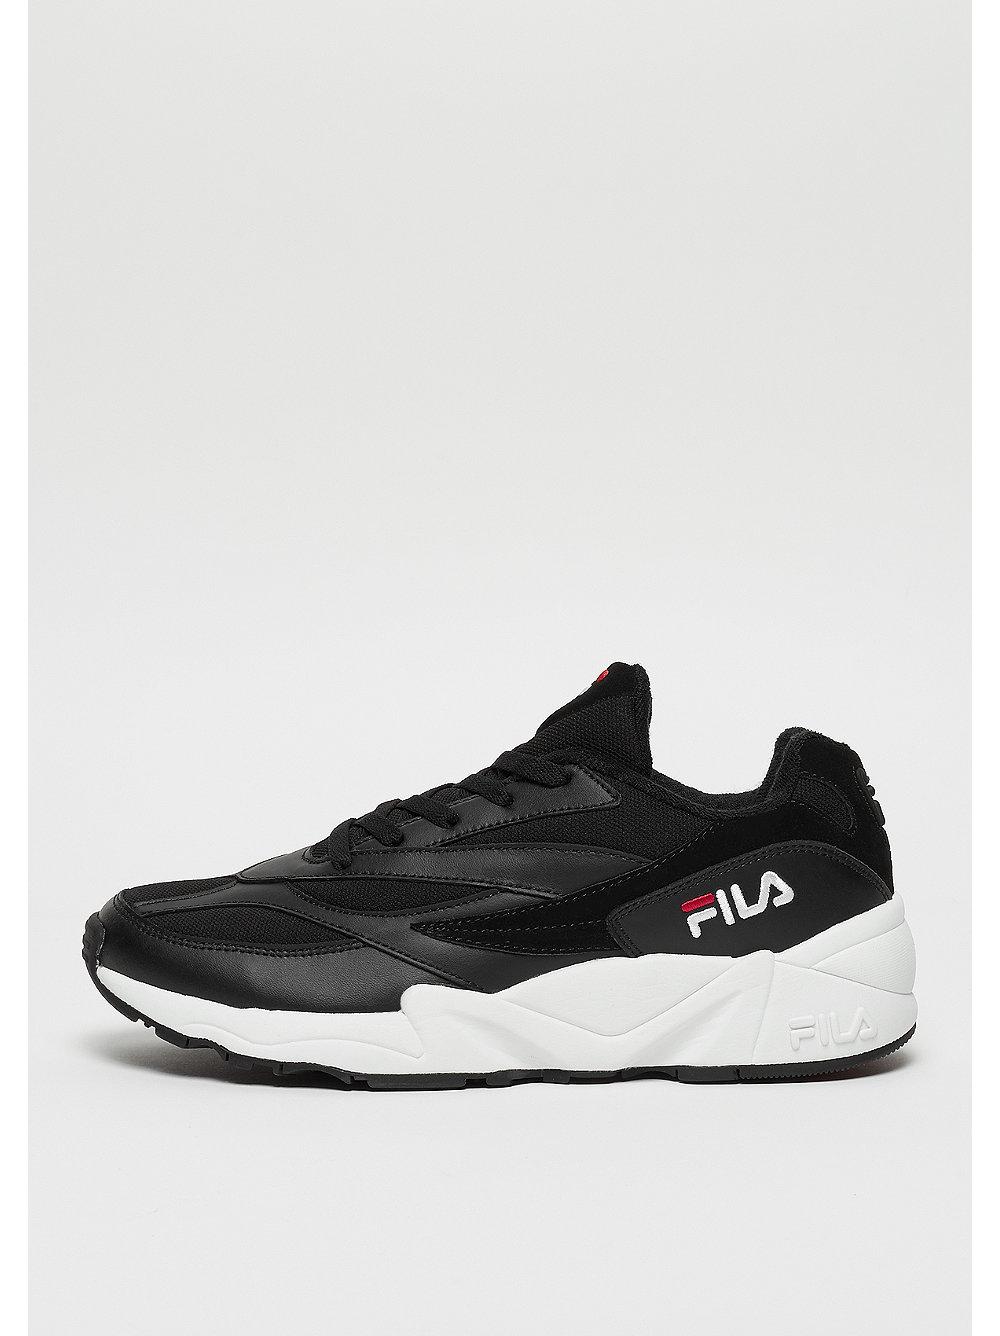 Fila FILA 94 low black